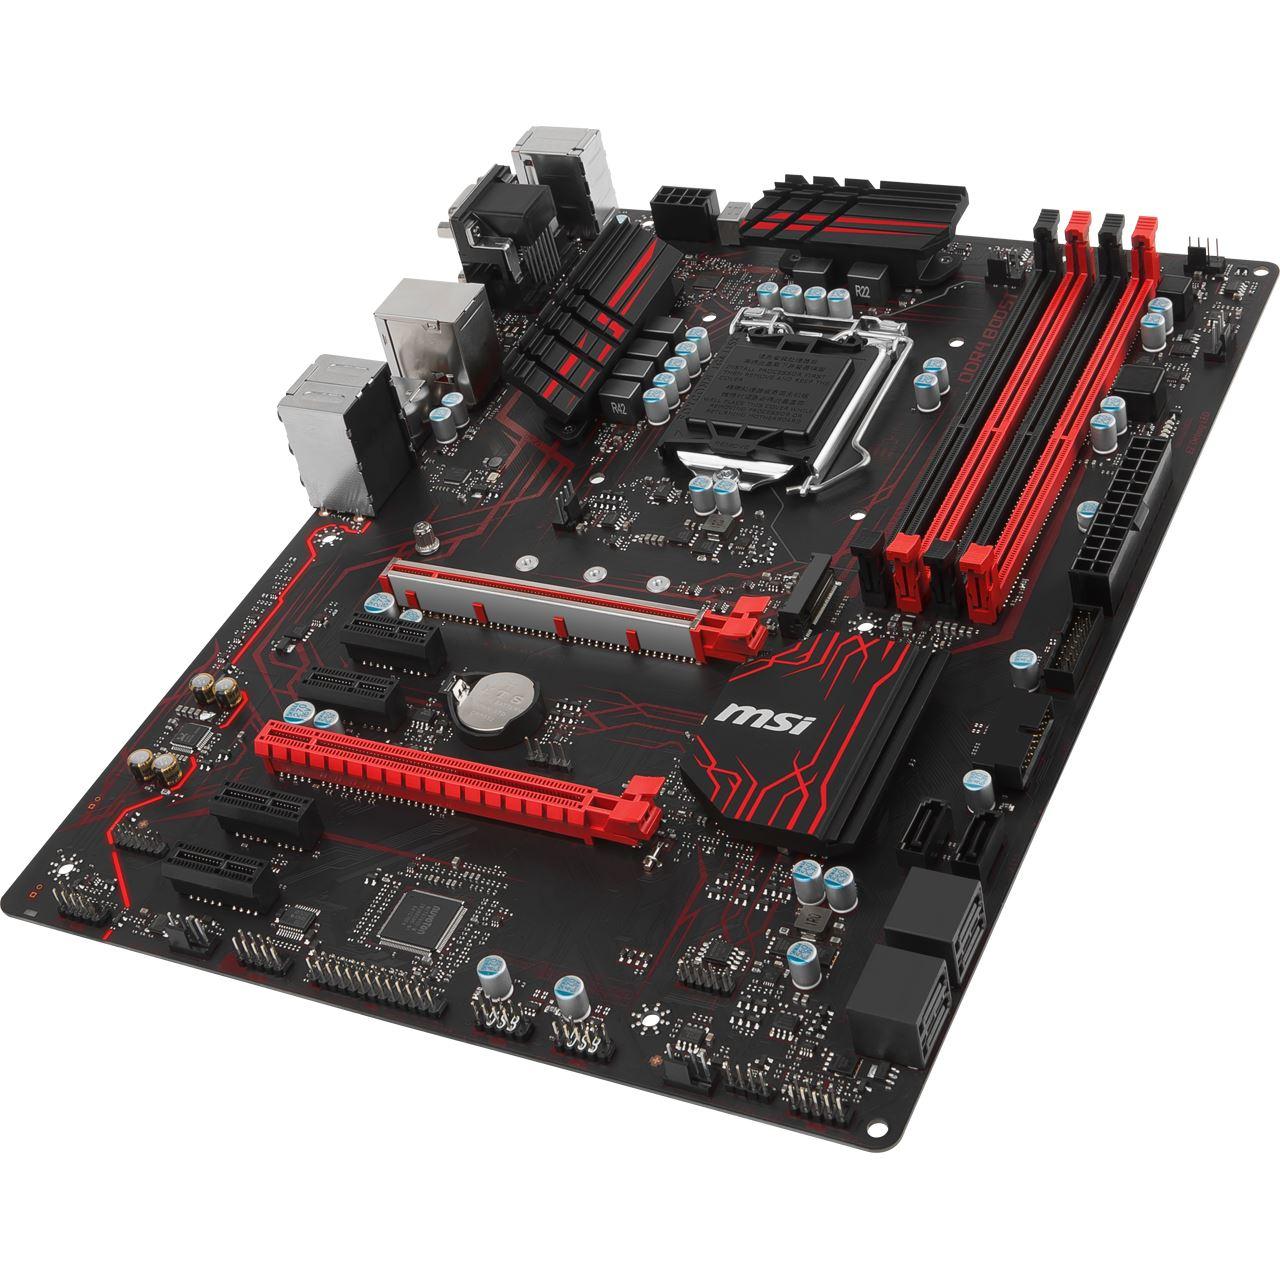 Info Harga Msi Z170a Mpower Gaming Titanium Lga 1151 Intel Z170 Hdmi Tang Ampere Fluke 376 With Ifex Z270 Plus So1151 Dual Channel Ddr4 Atx Retail